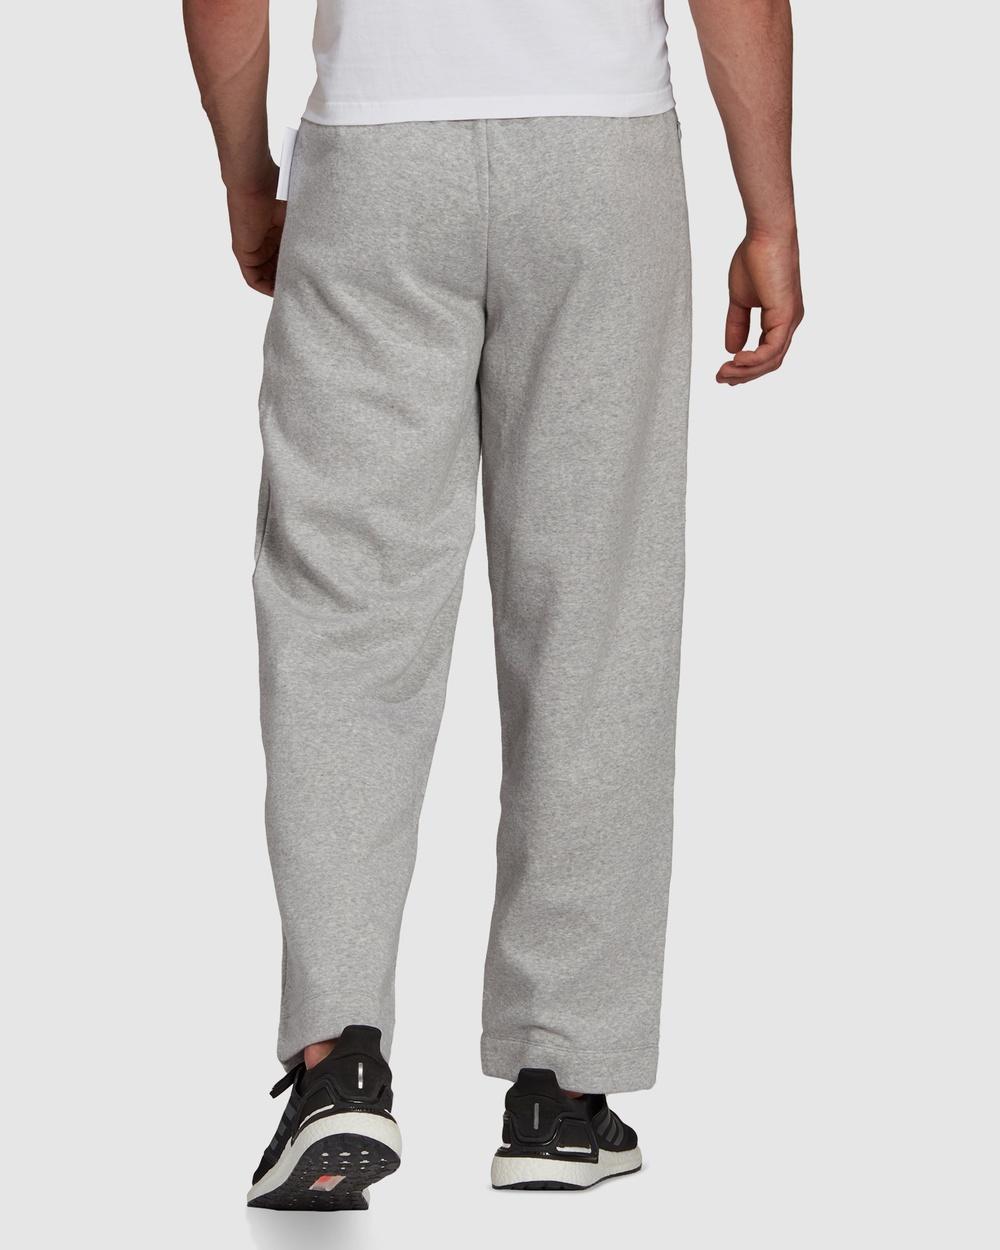 adidas Performance Sportswear Comfy and Chill Fleece Pants Grey